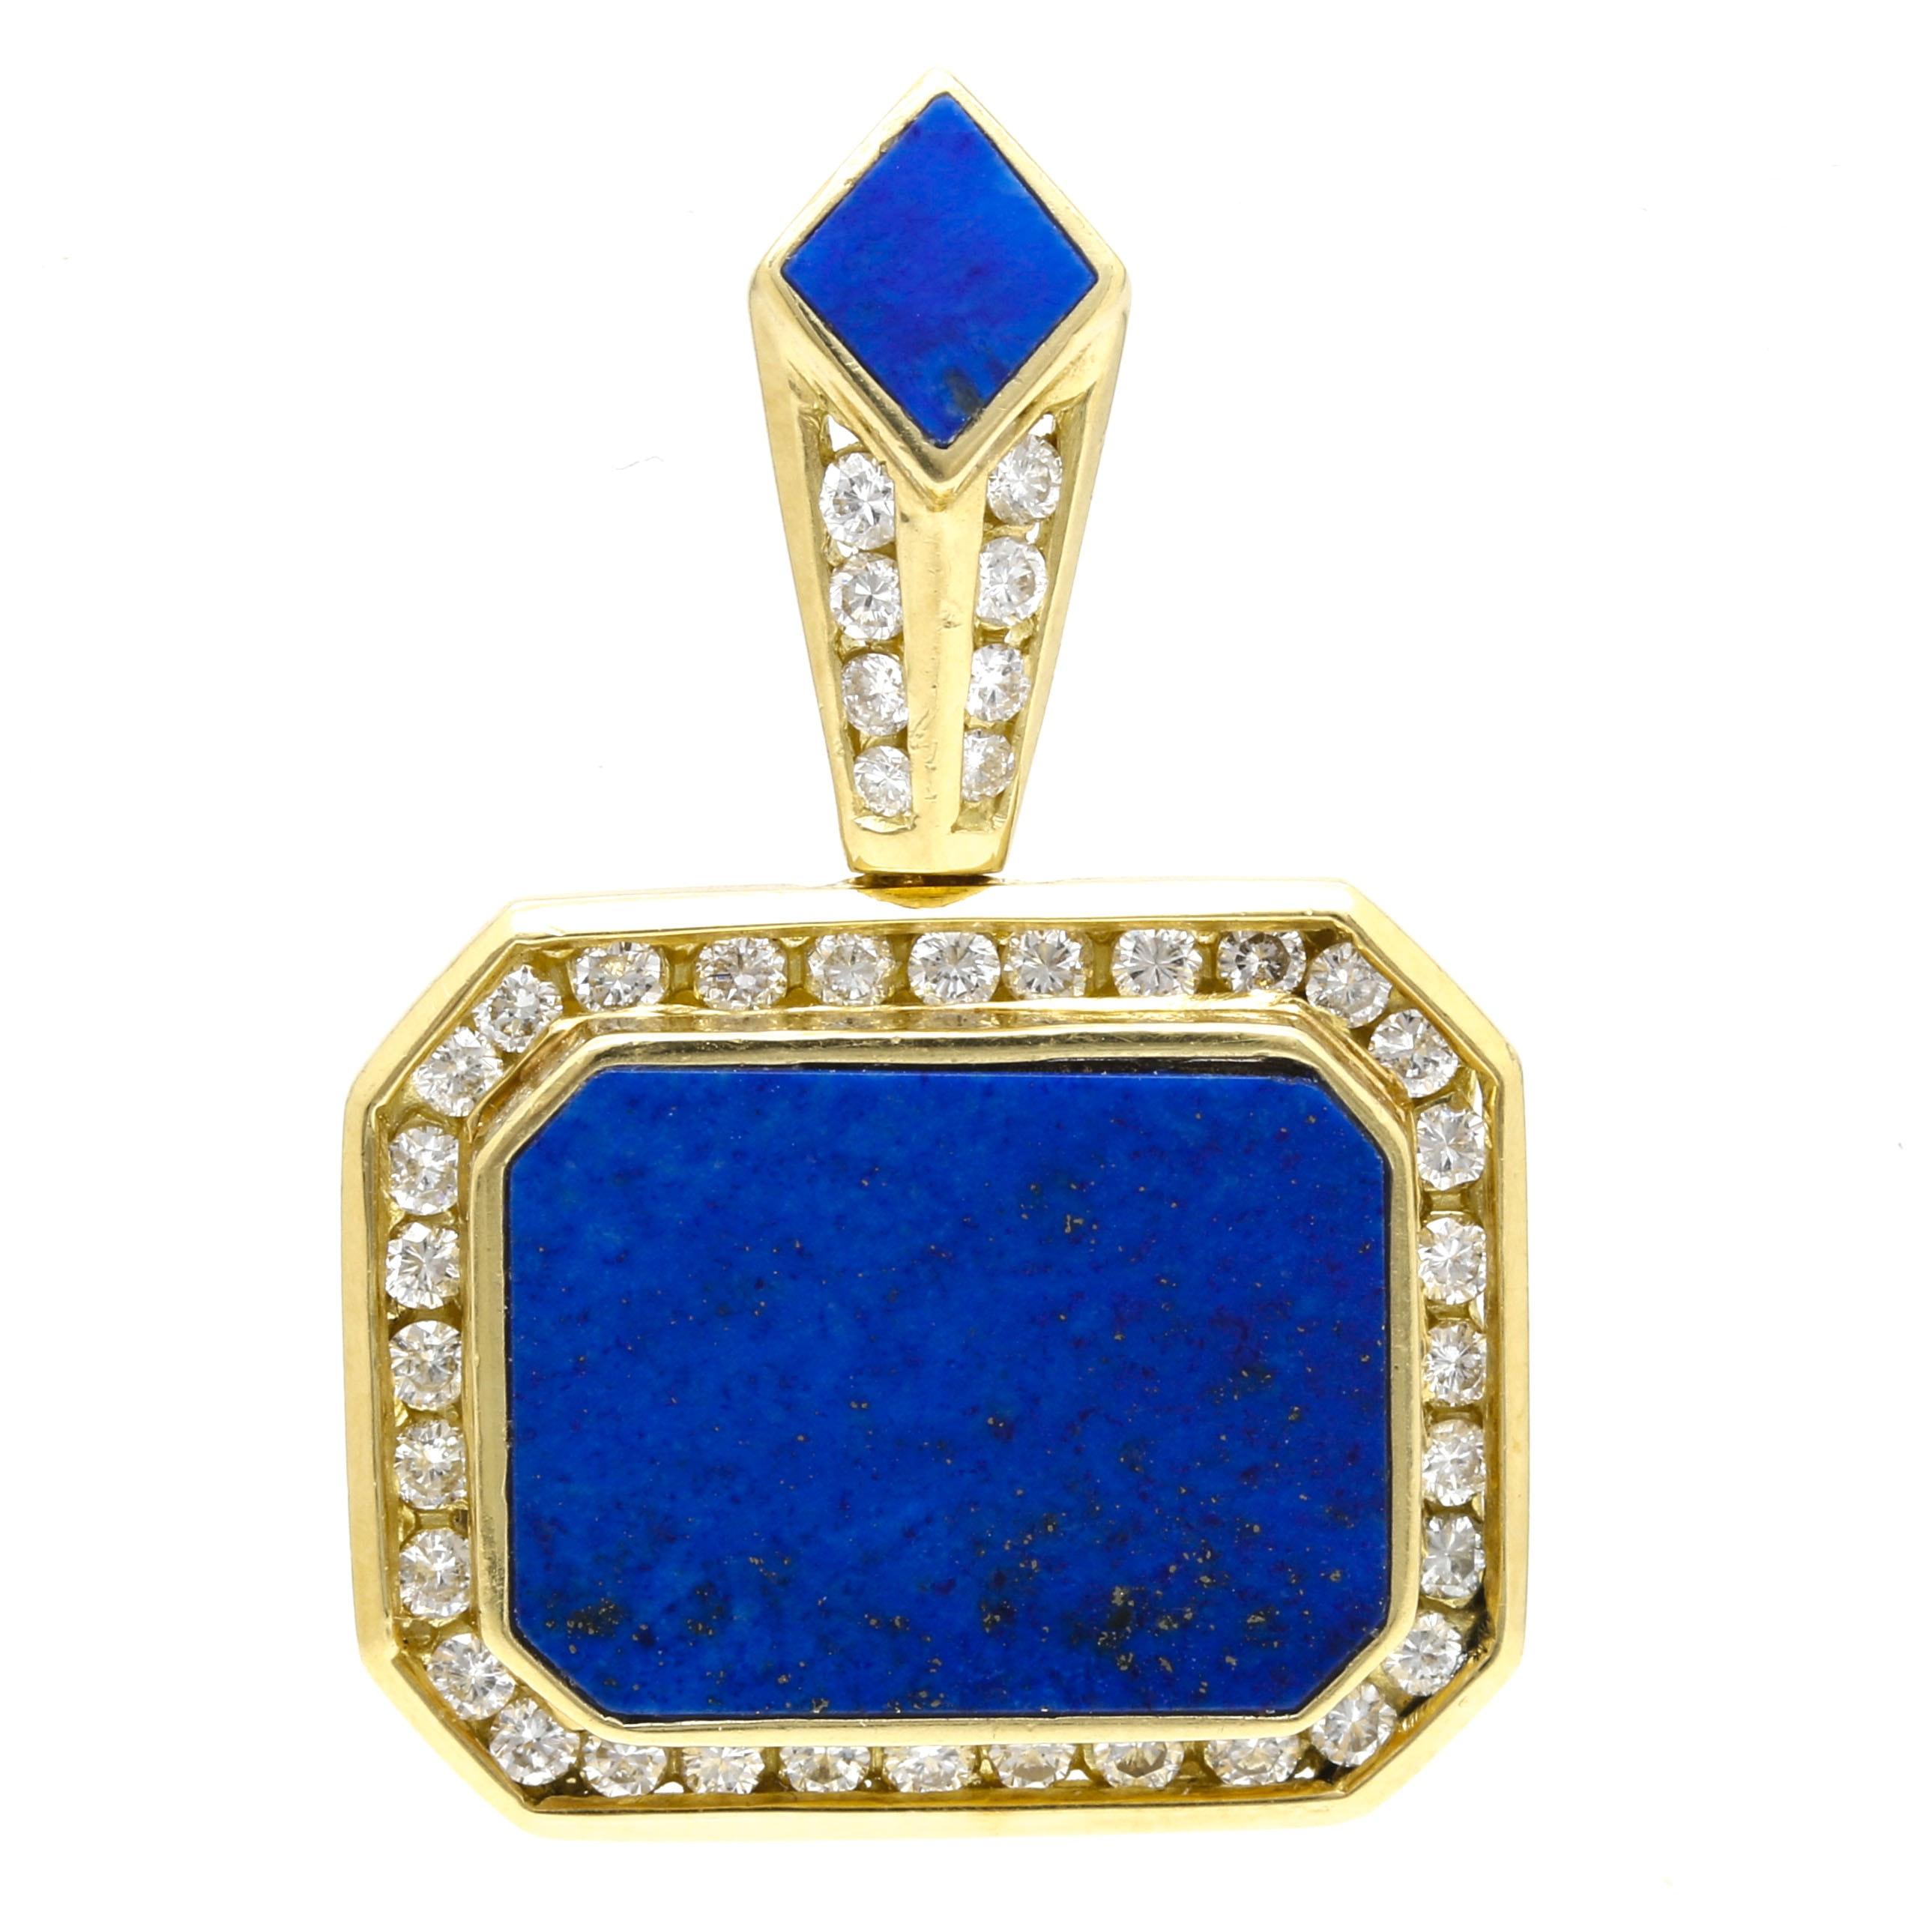 La Triomphe 18K Yellow Gold Lapis Lazuli and Diamond Pendant